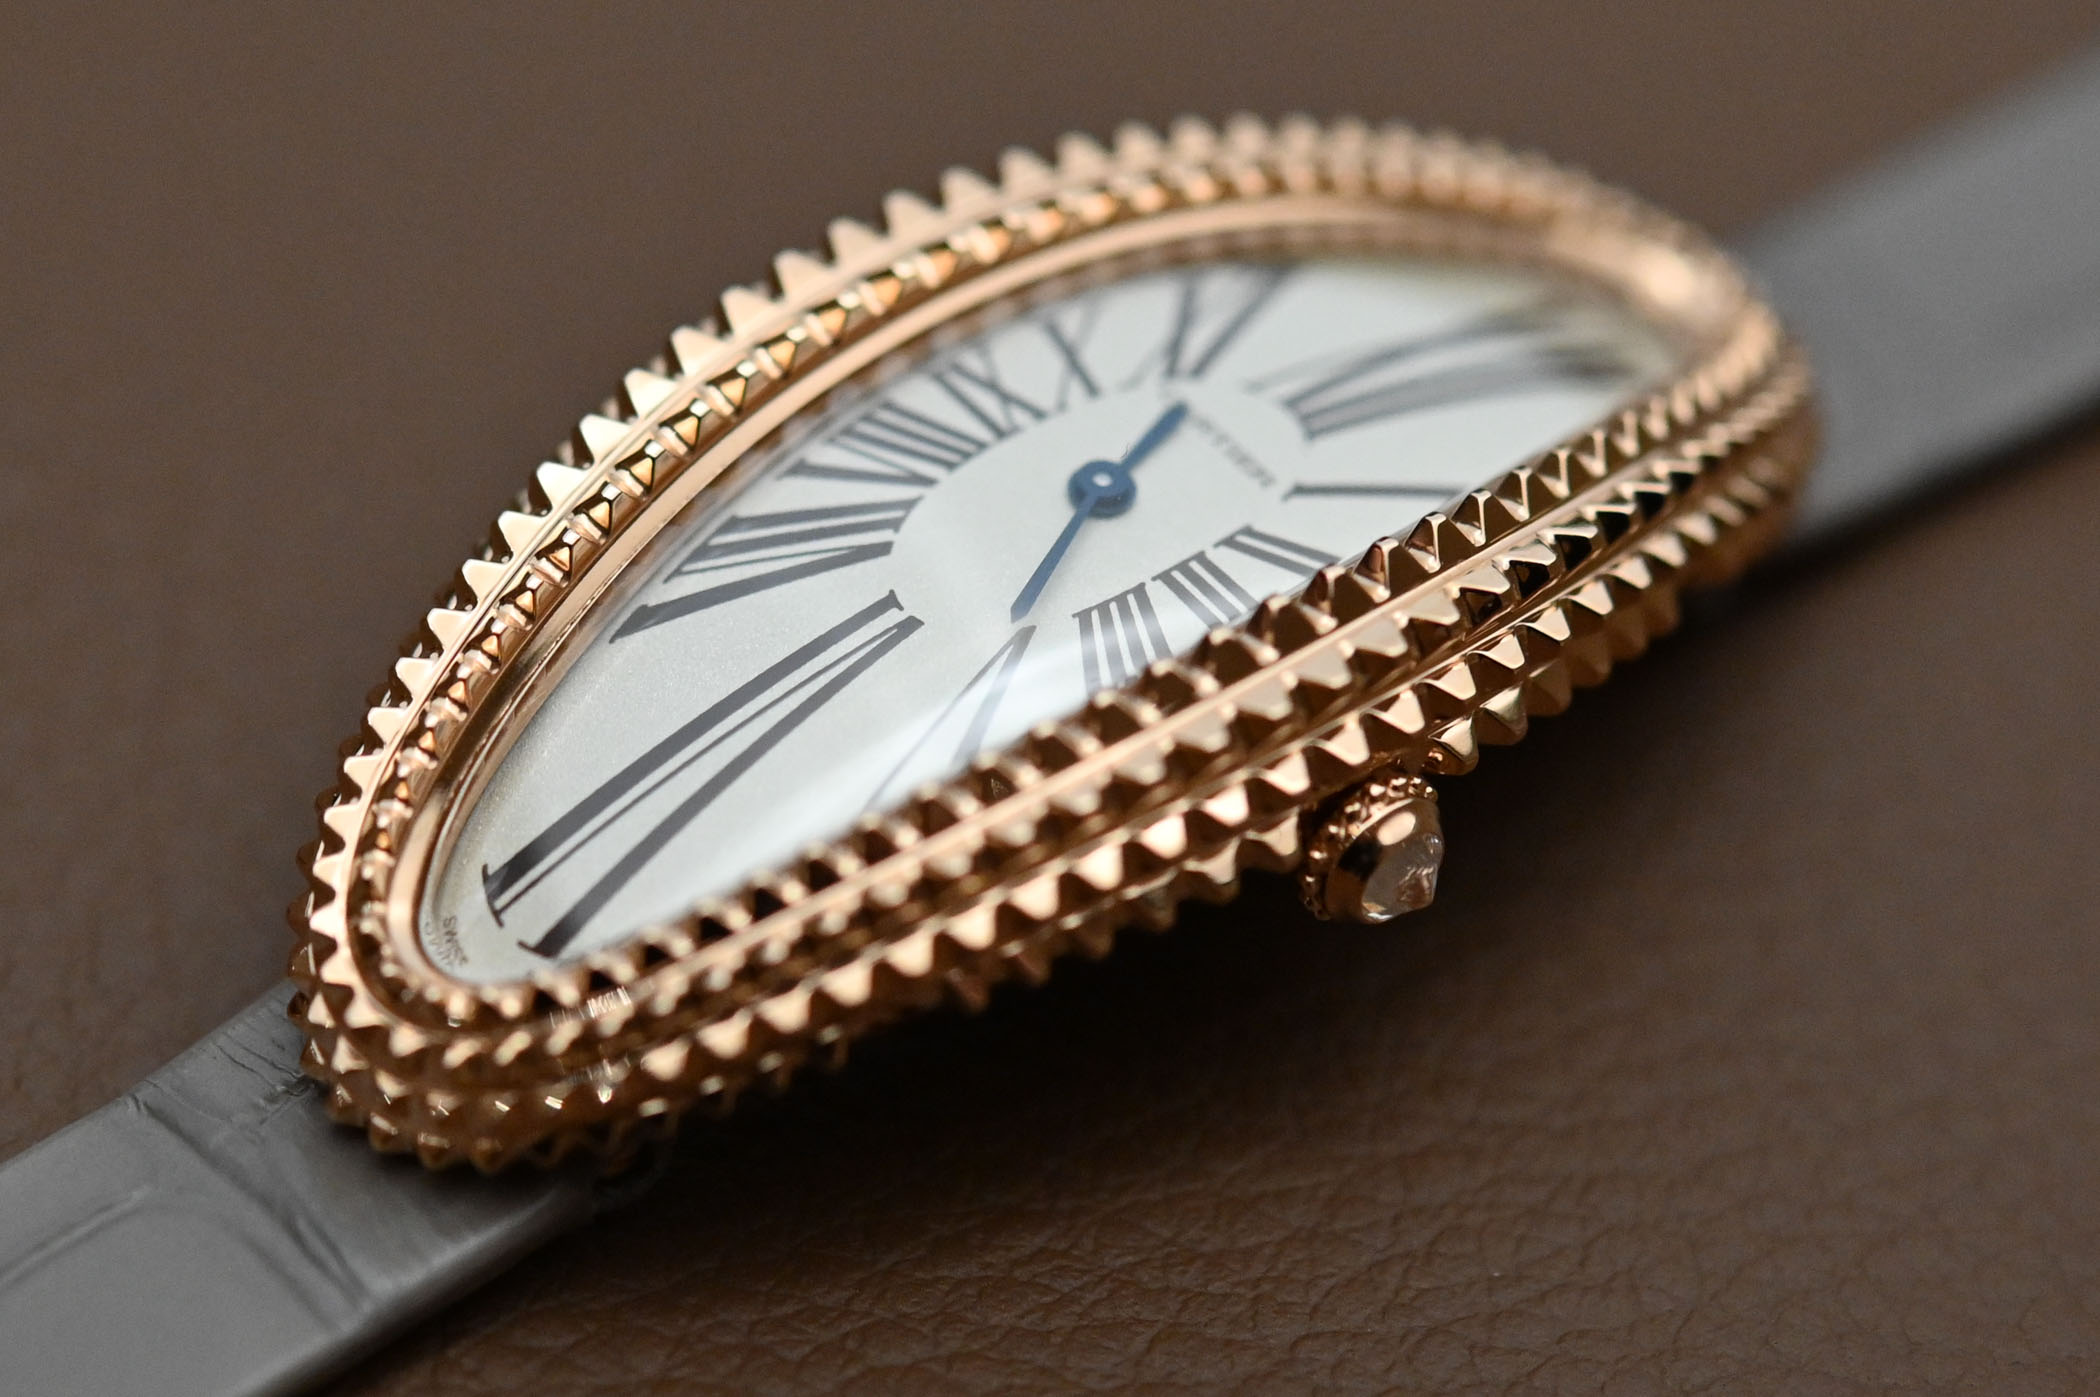 The Cartier Baignoire Allongee Monochrome Watches